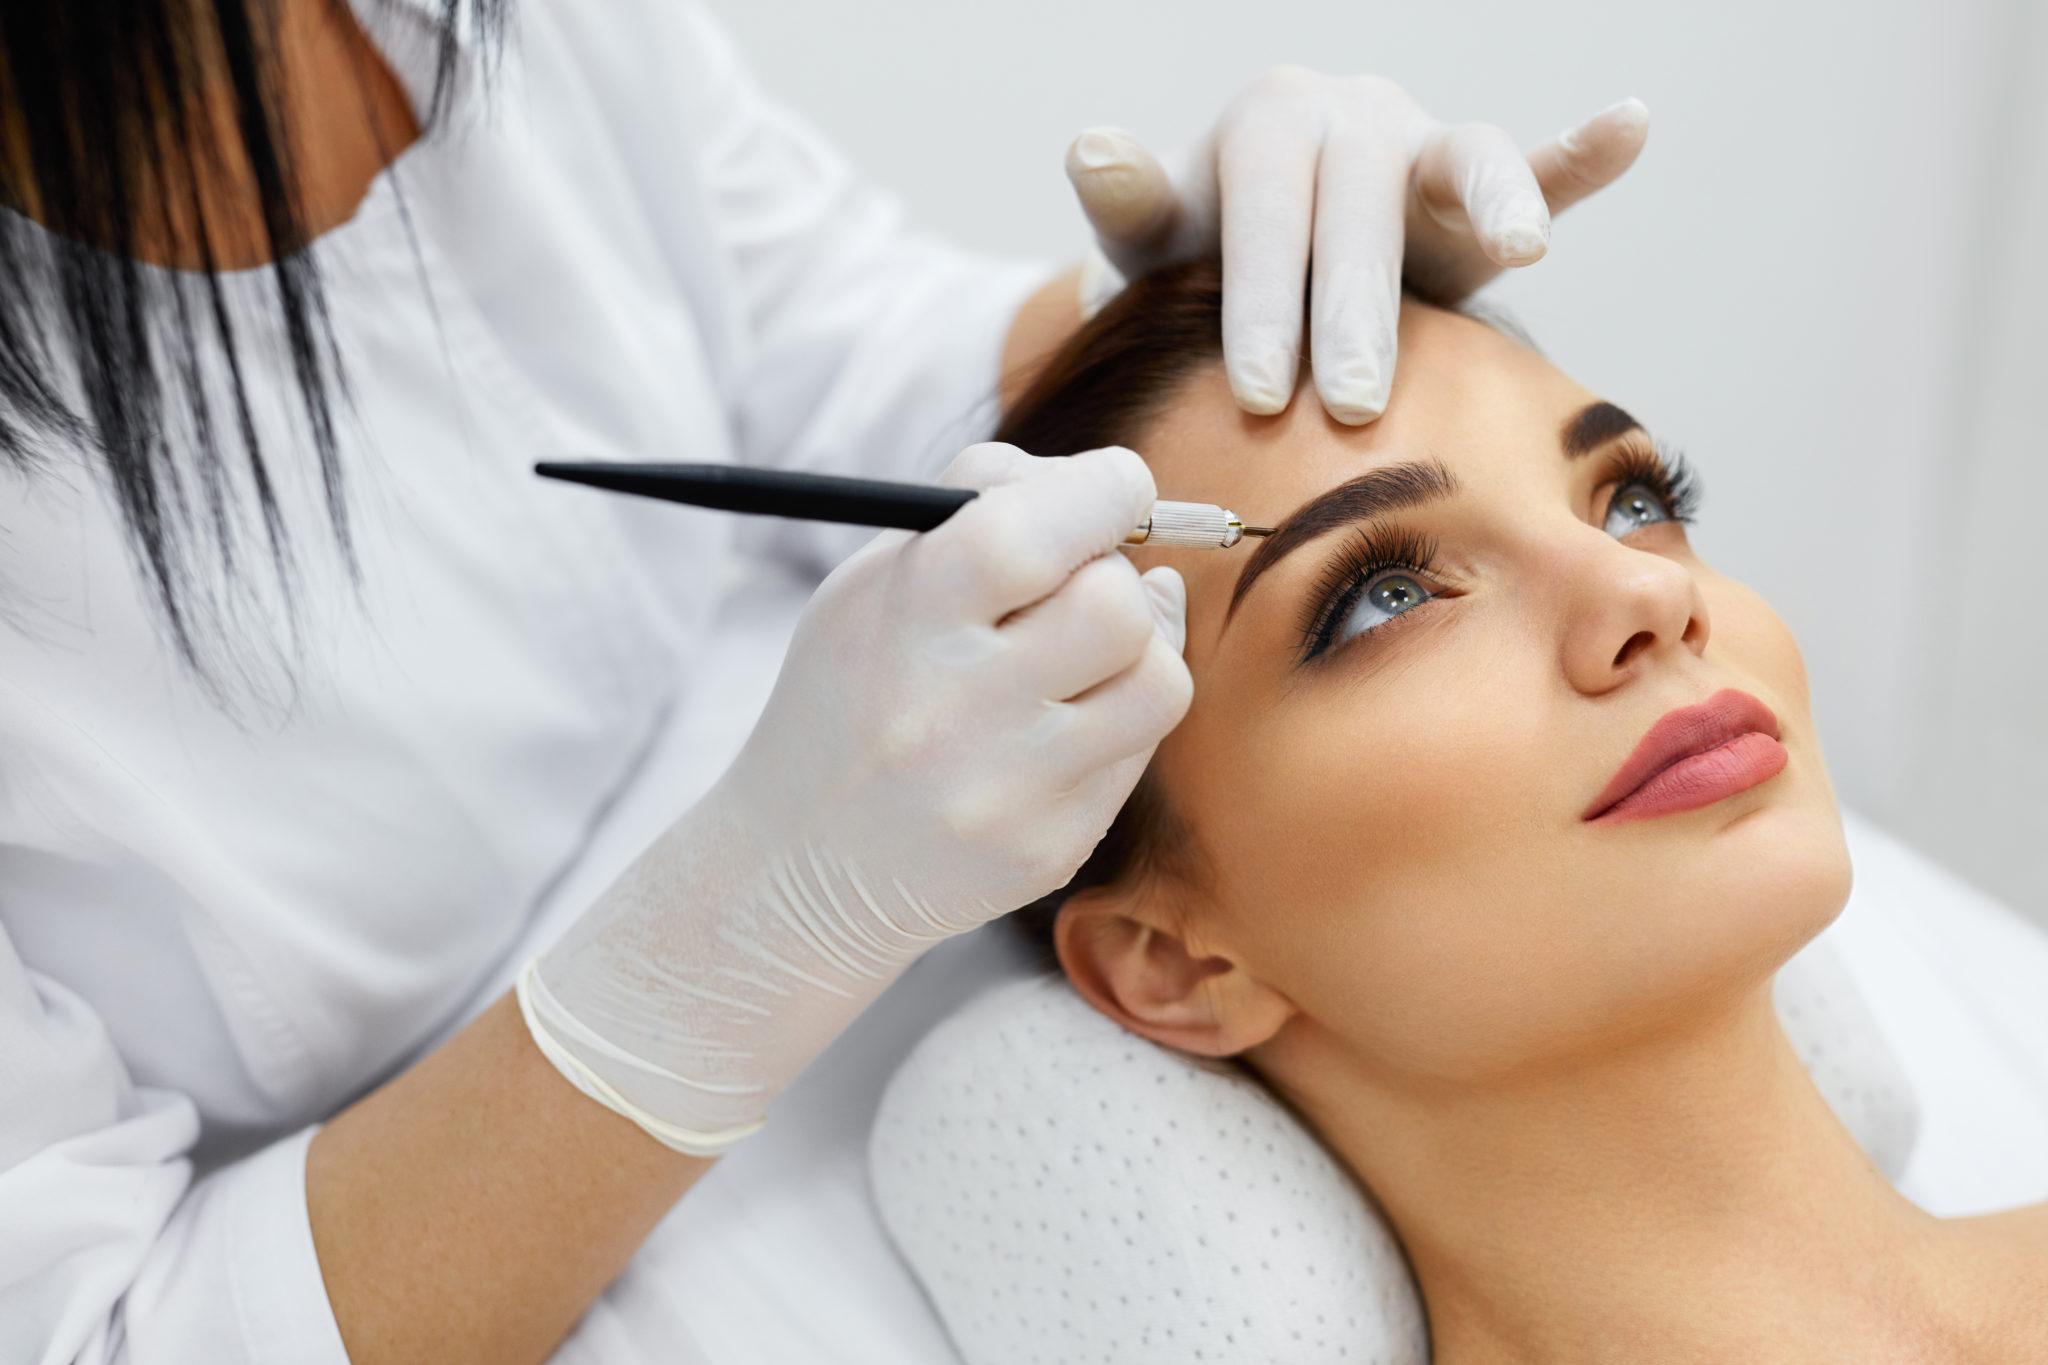 eyebrow tattoo removal